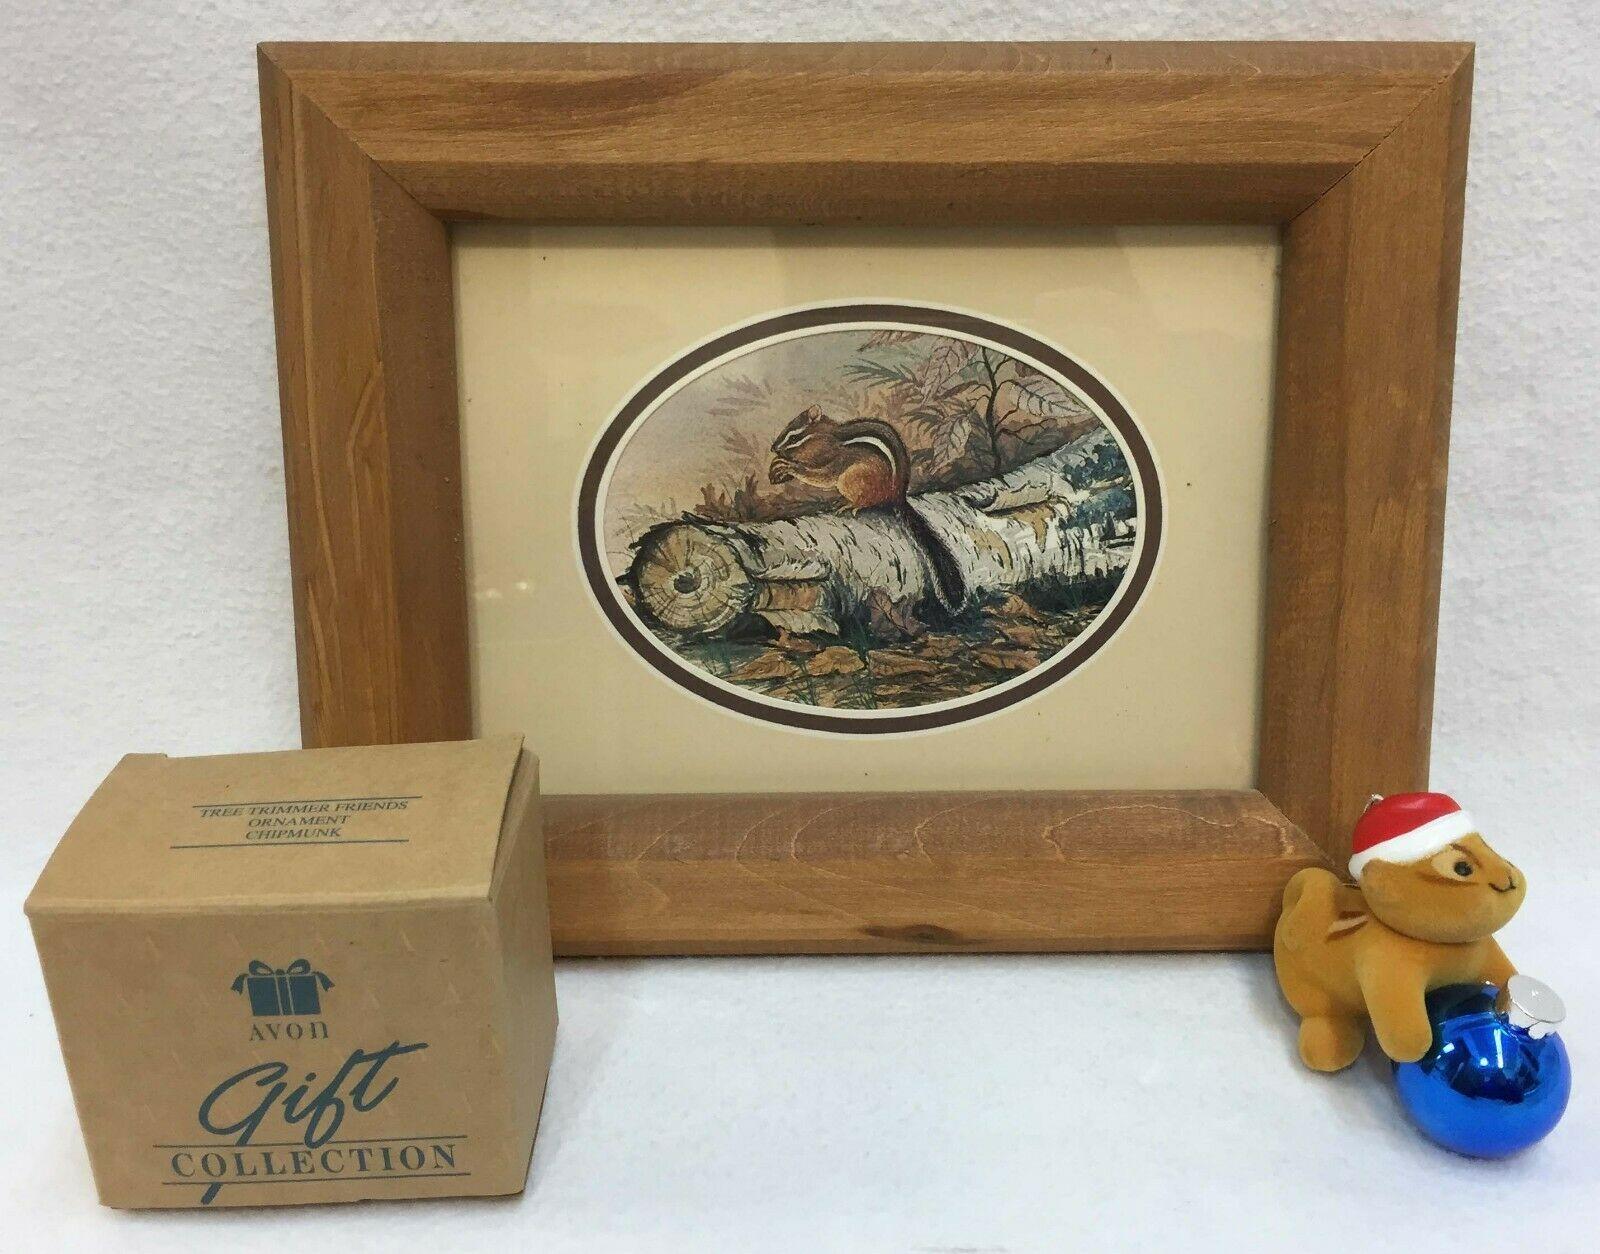 Chipmunk Print Natural Wood Frame 9 x 7 & Avon Tree Trimmer Chipmunk Ornament